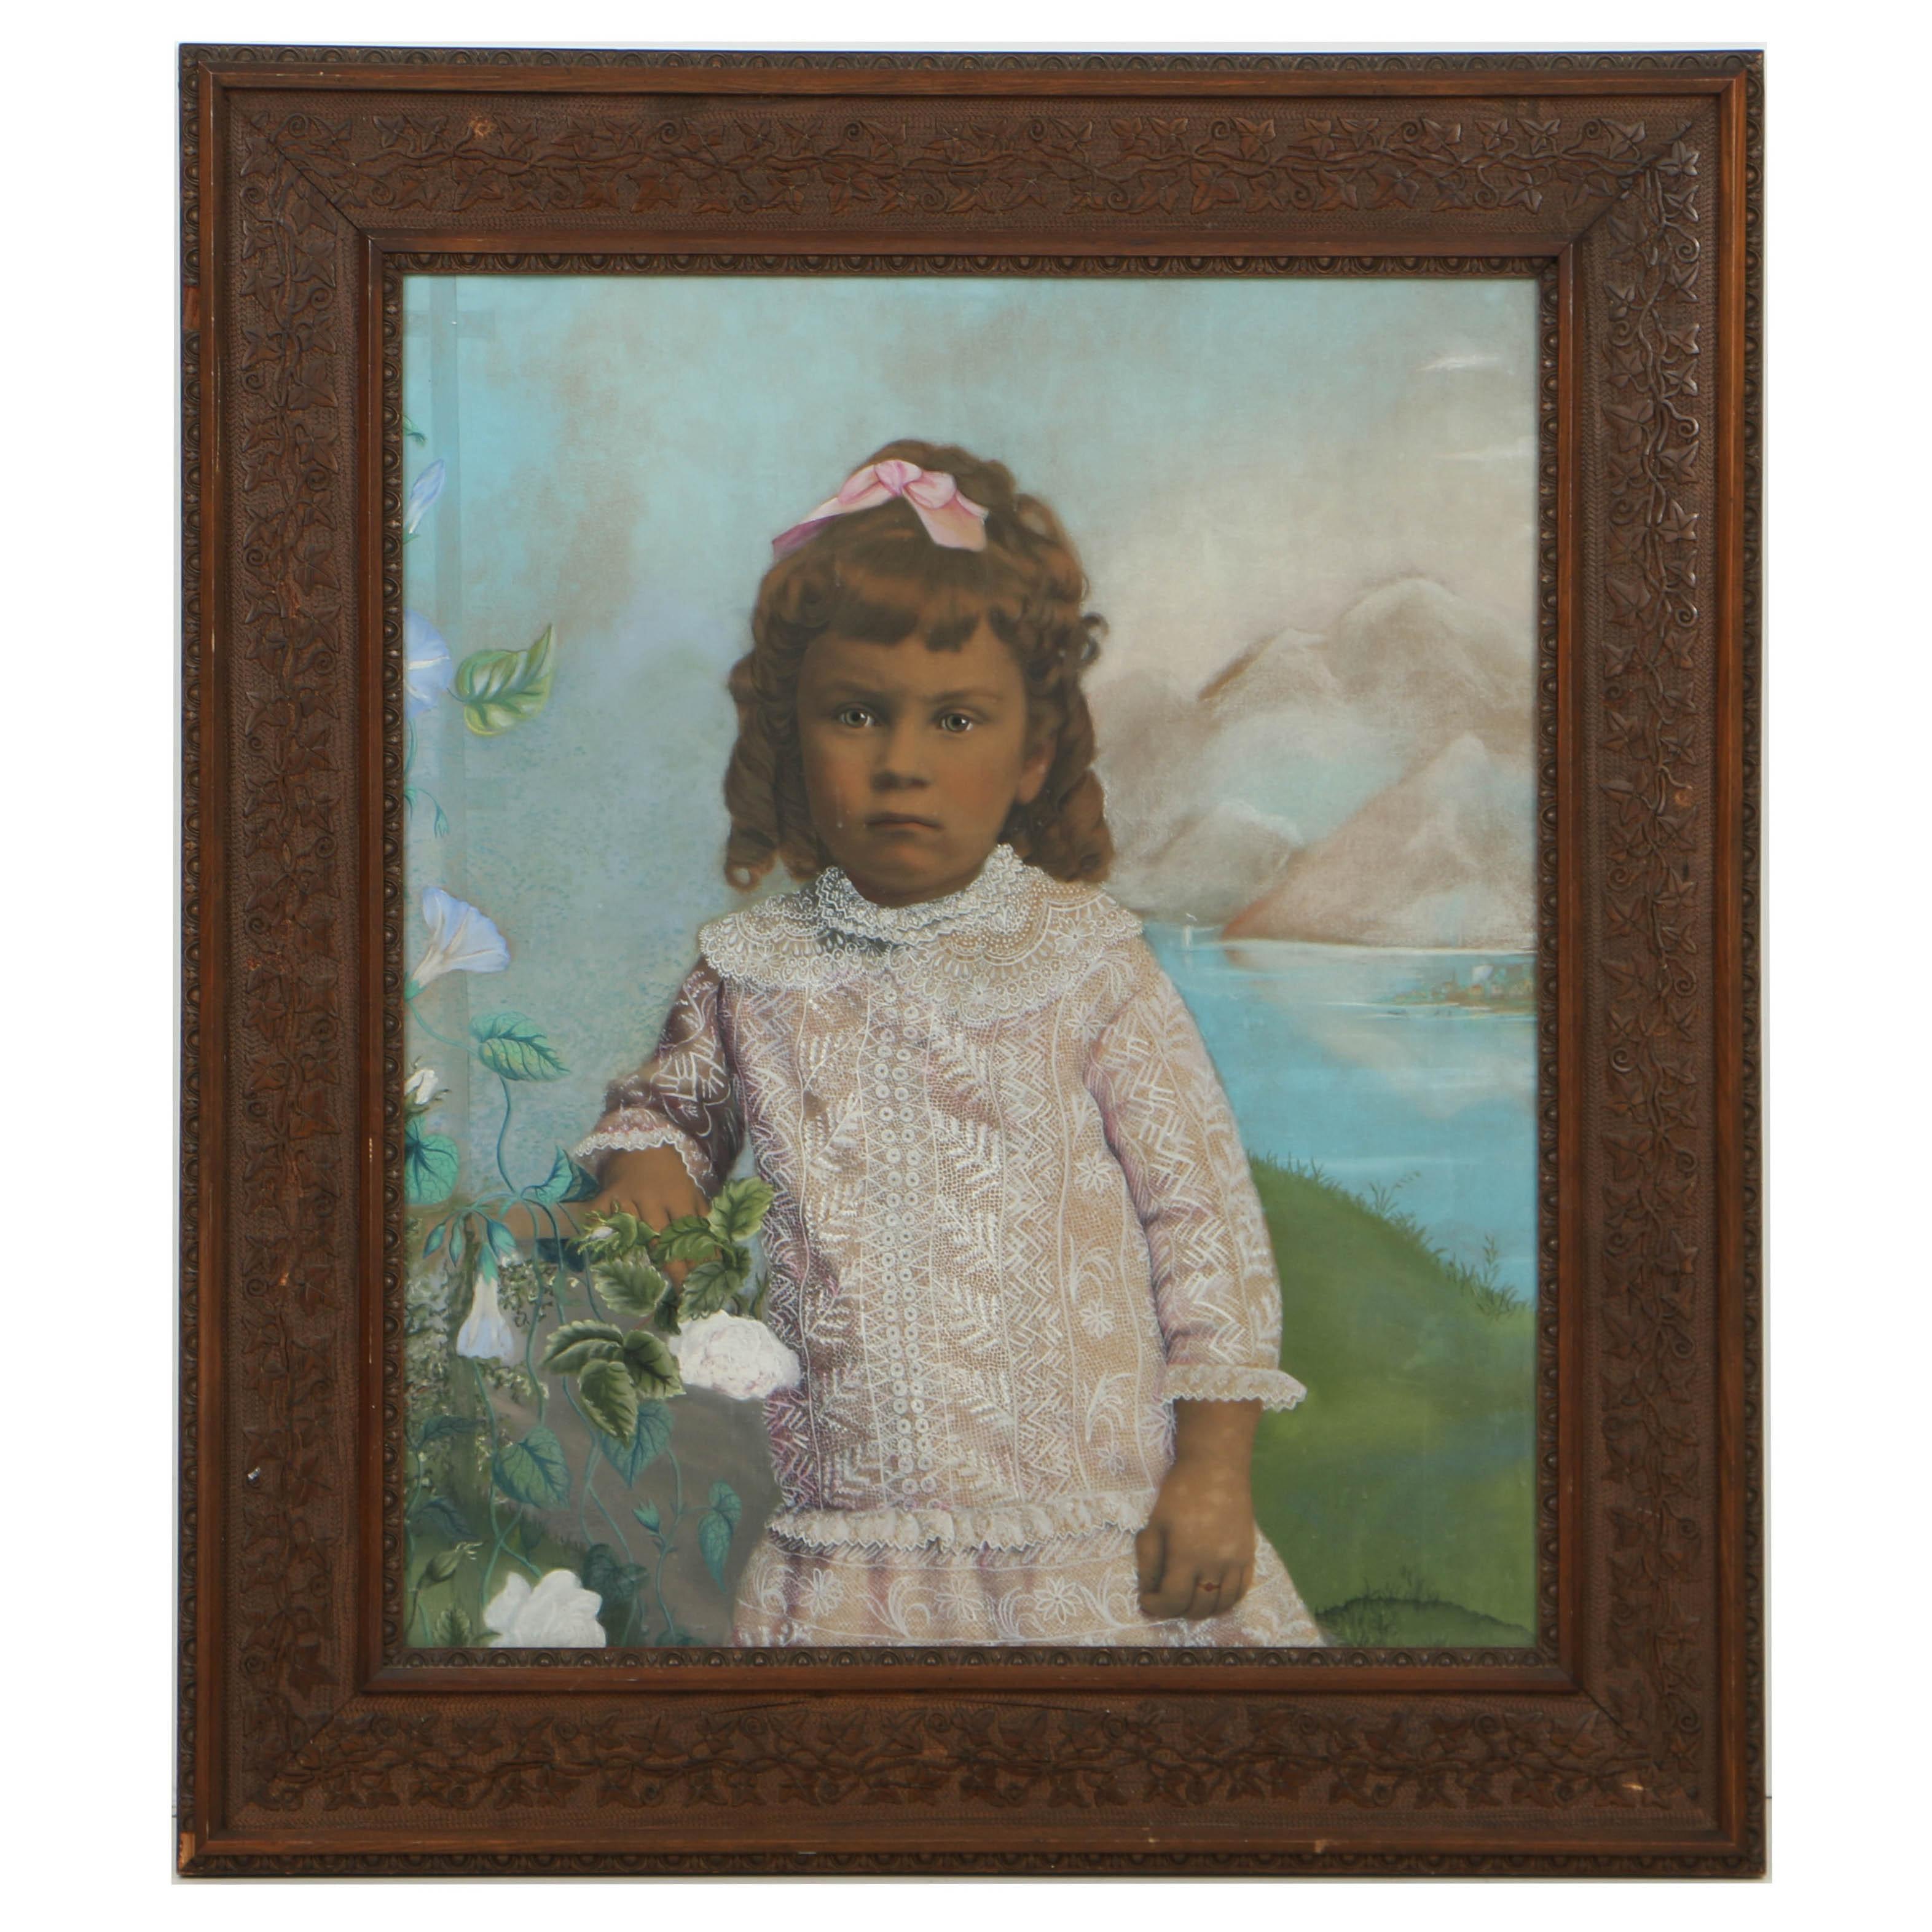 19th Century Folk Style Crayon Portrait of a Girl